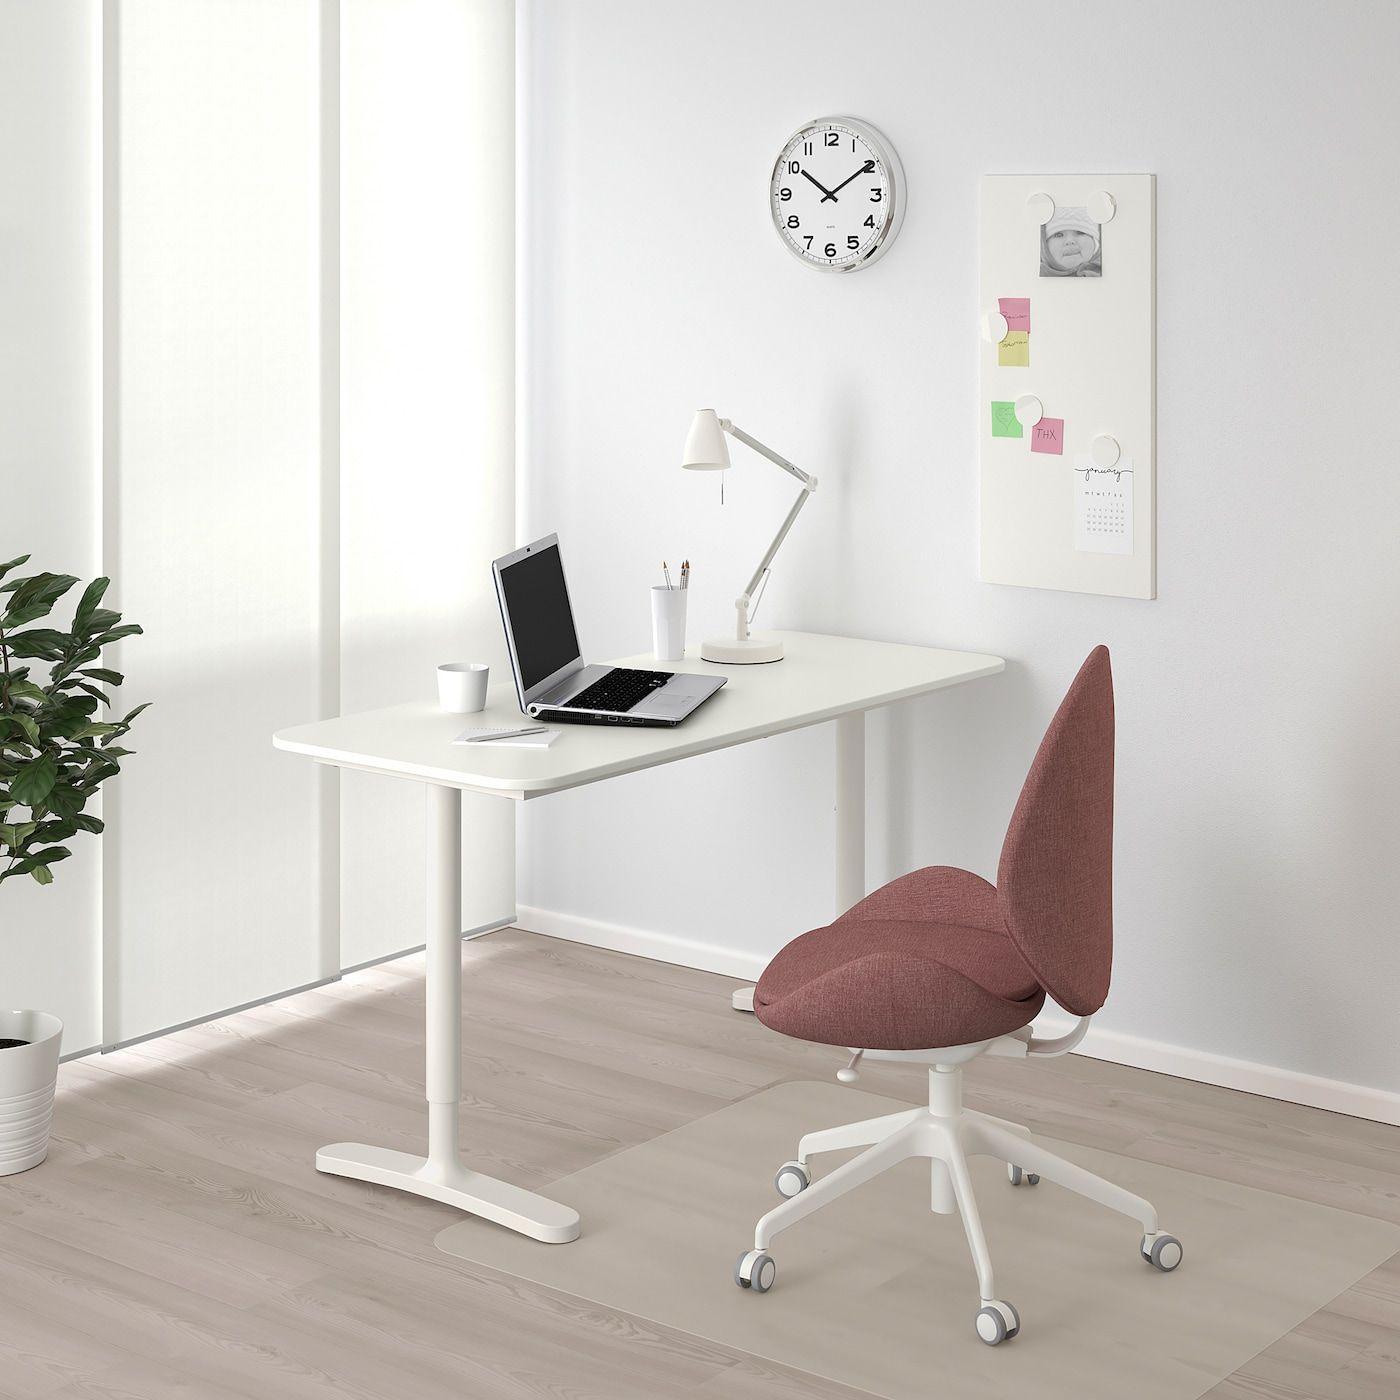 Bekant Bureau Wit 140x60 Cm Ikea Solutions De Rangement Ikea Bureau Angle